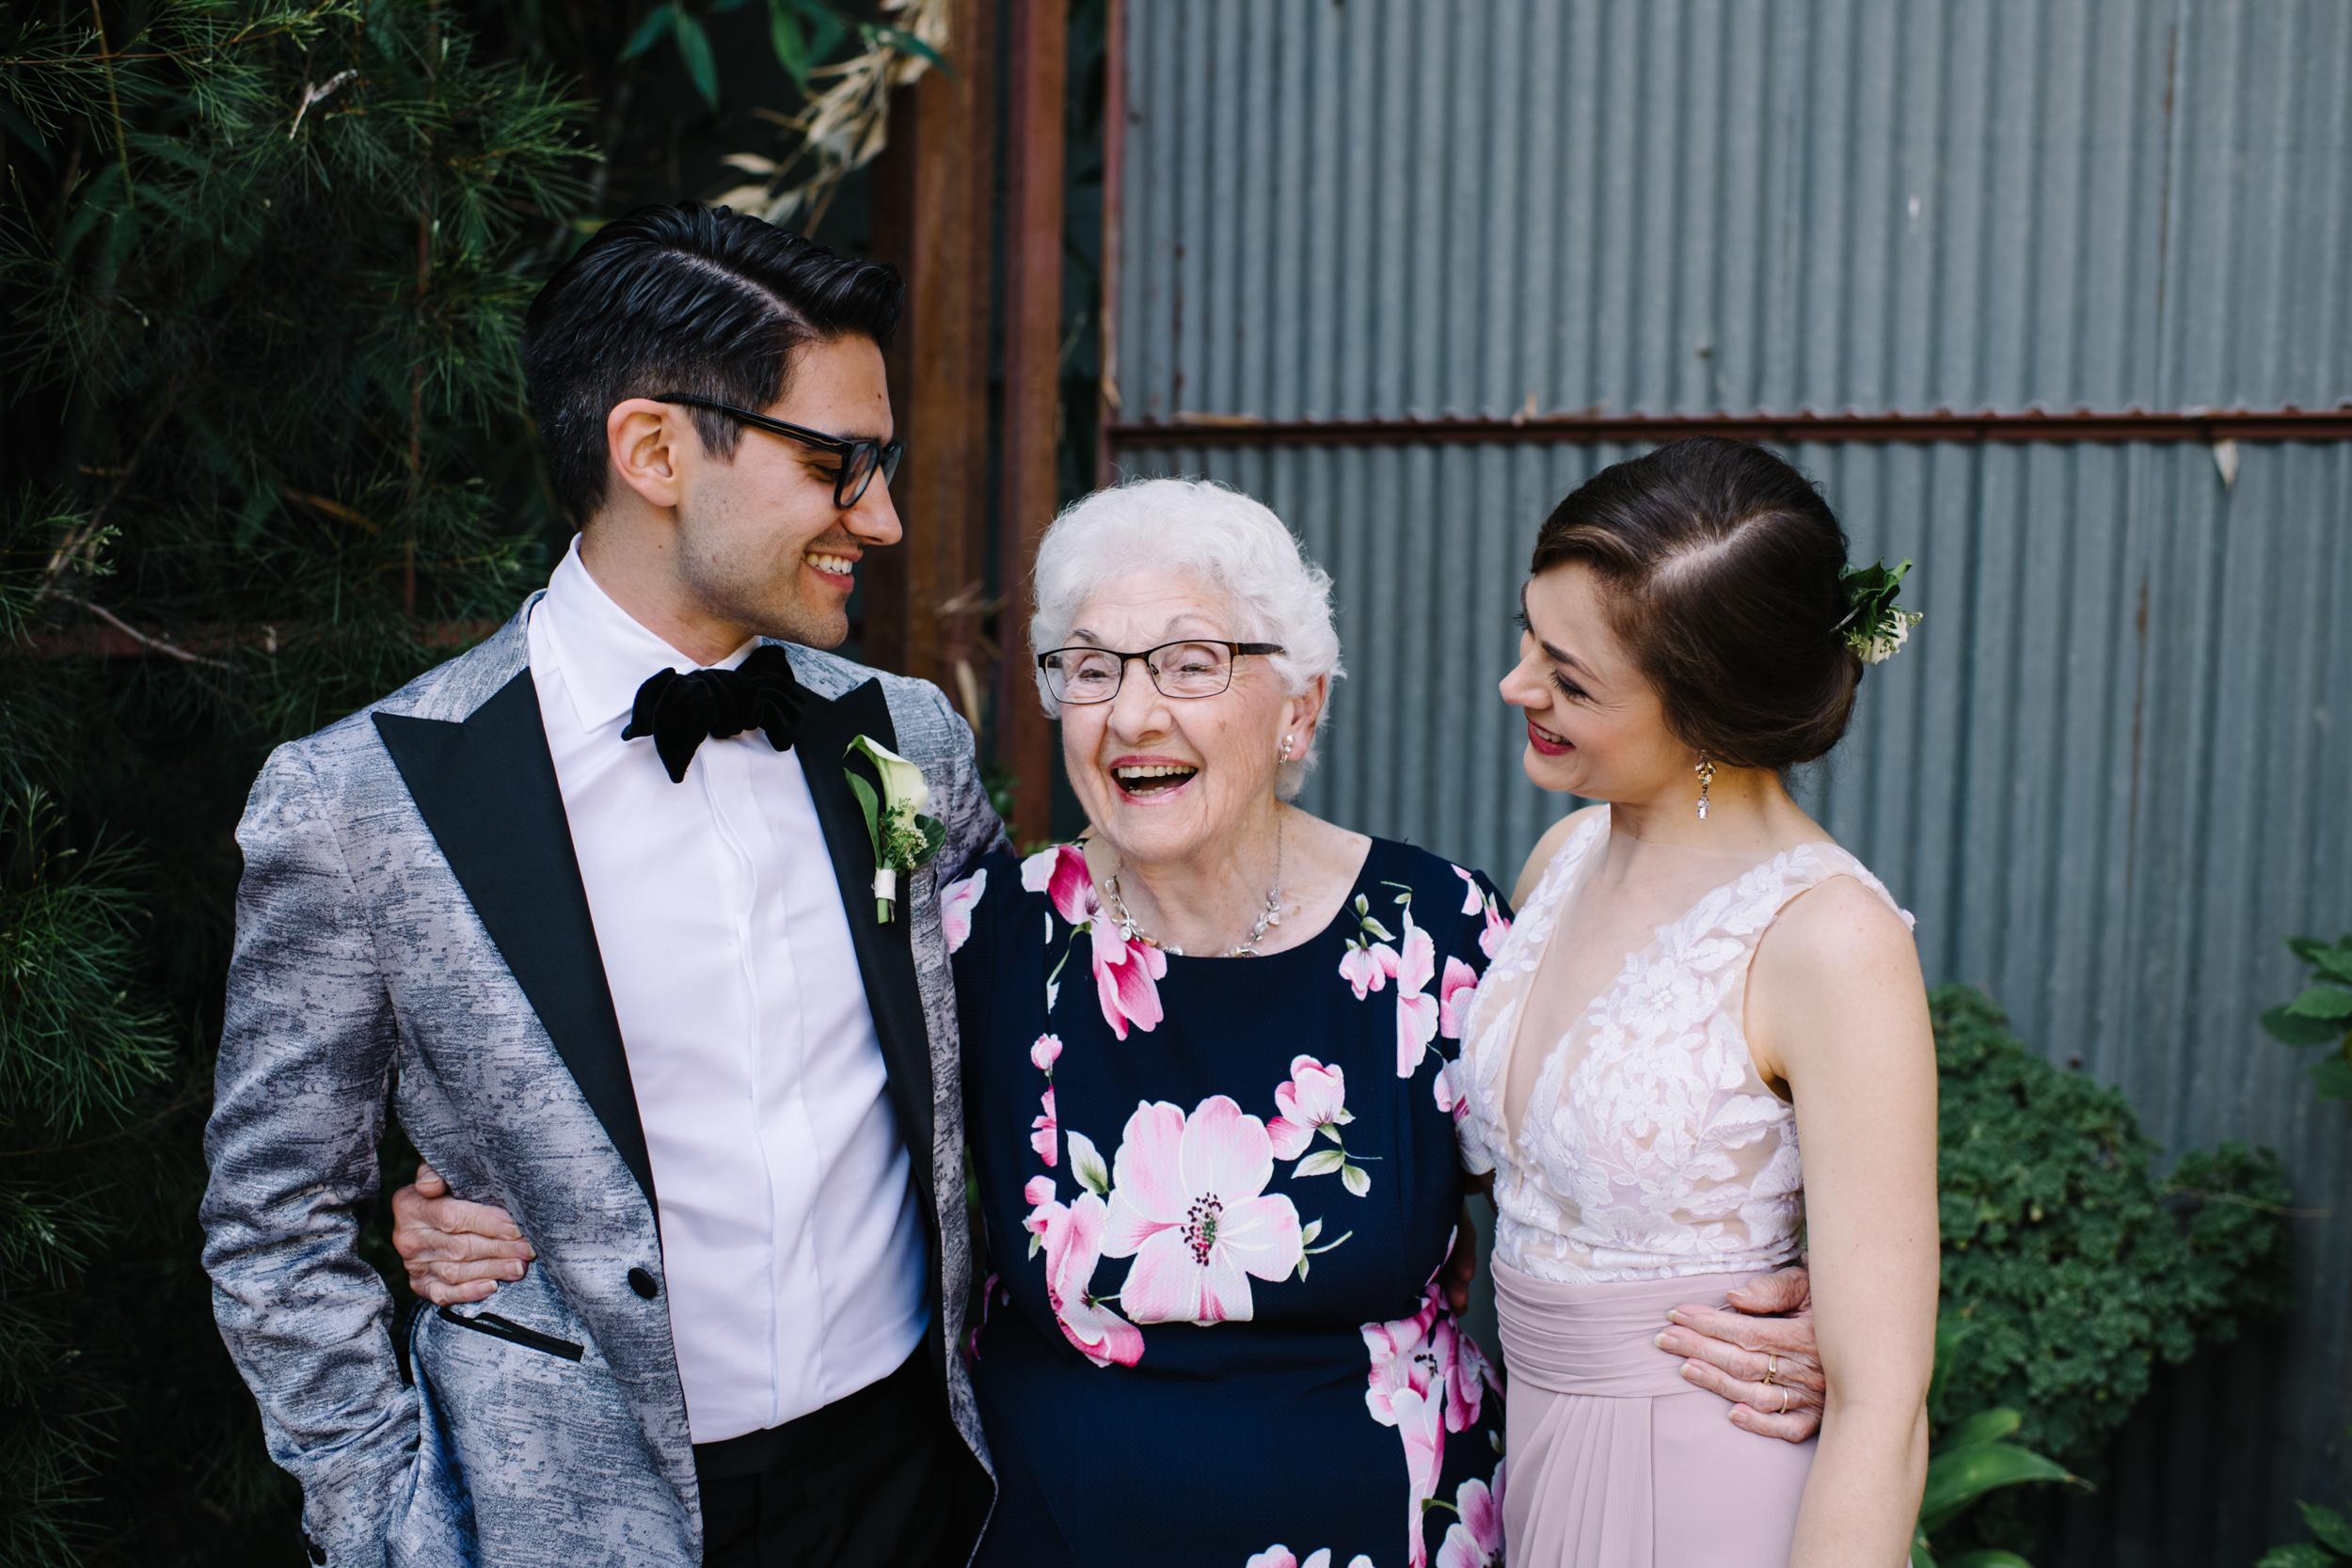 wedding_millwick_los_angeles-26.jpg